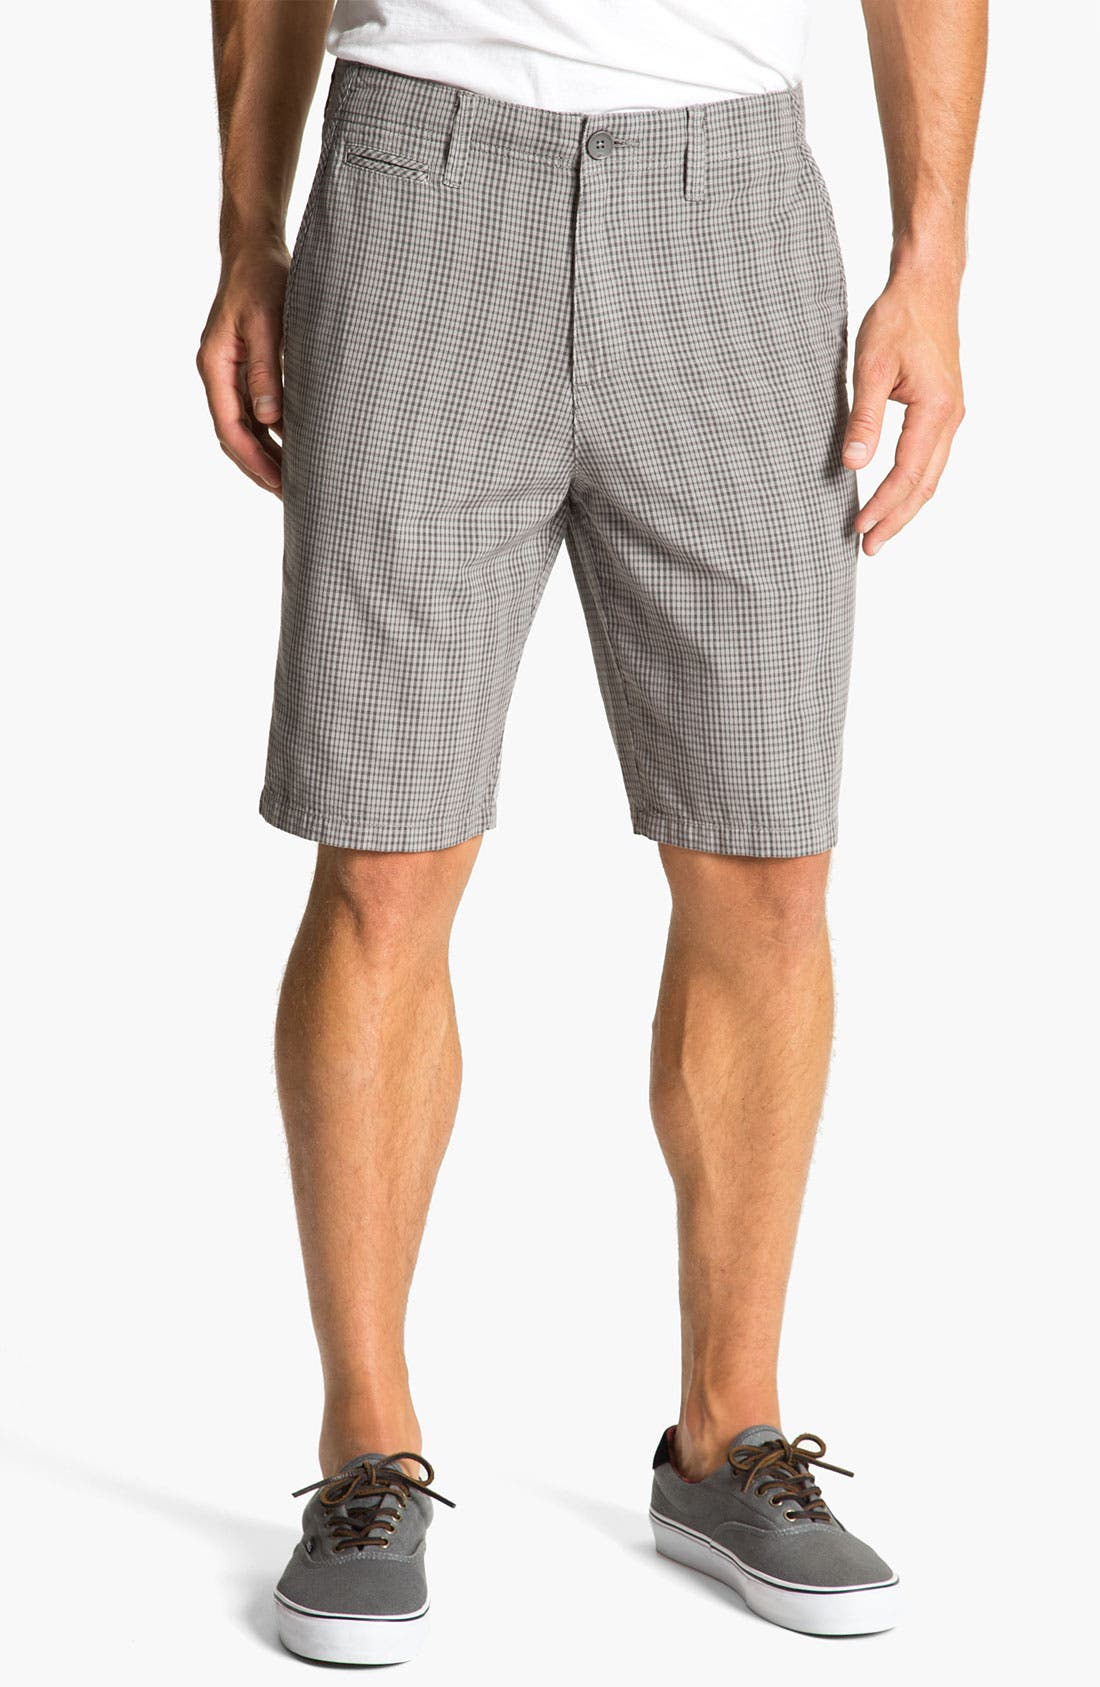 Alternate Image 1 Selected - Quiksilver 'Topanga' Check Shorts